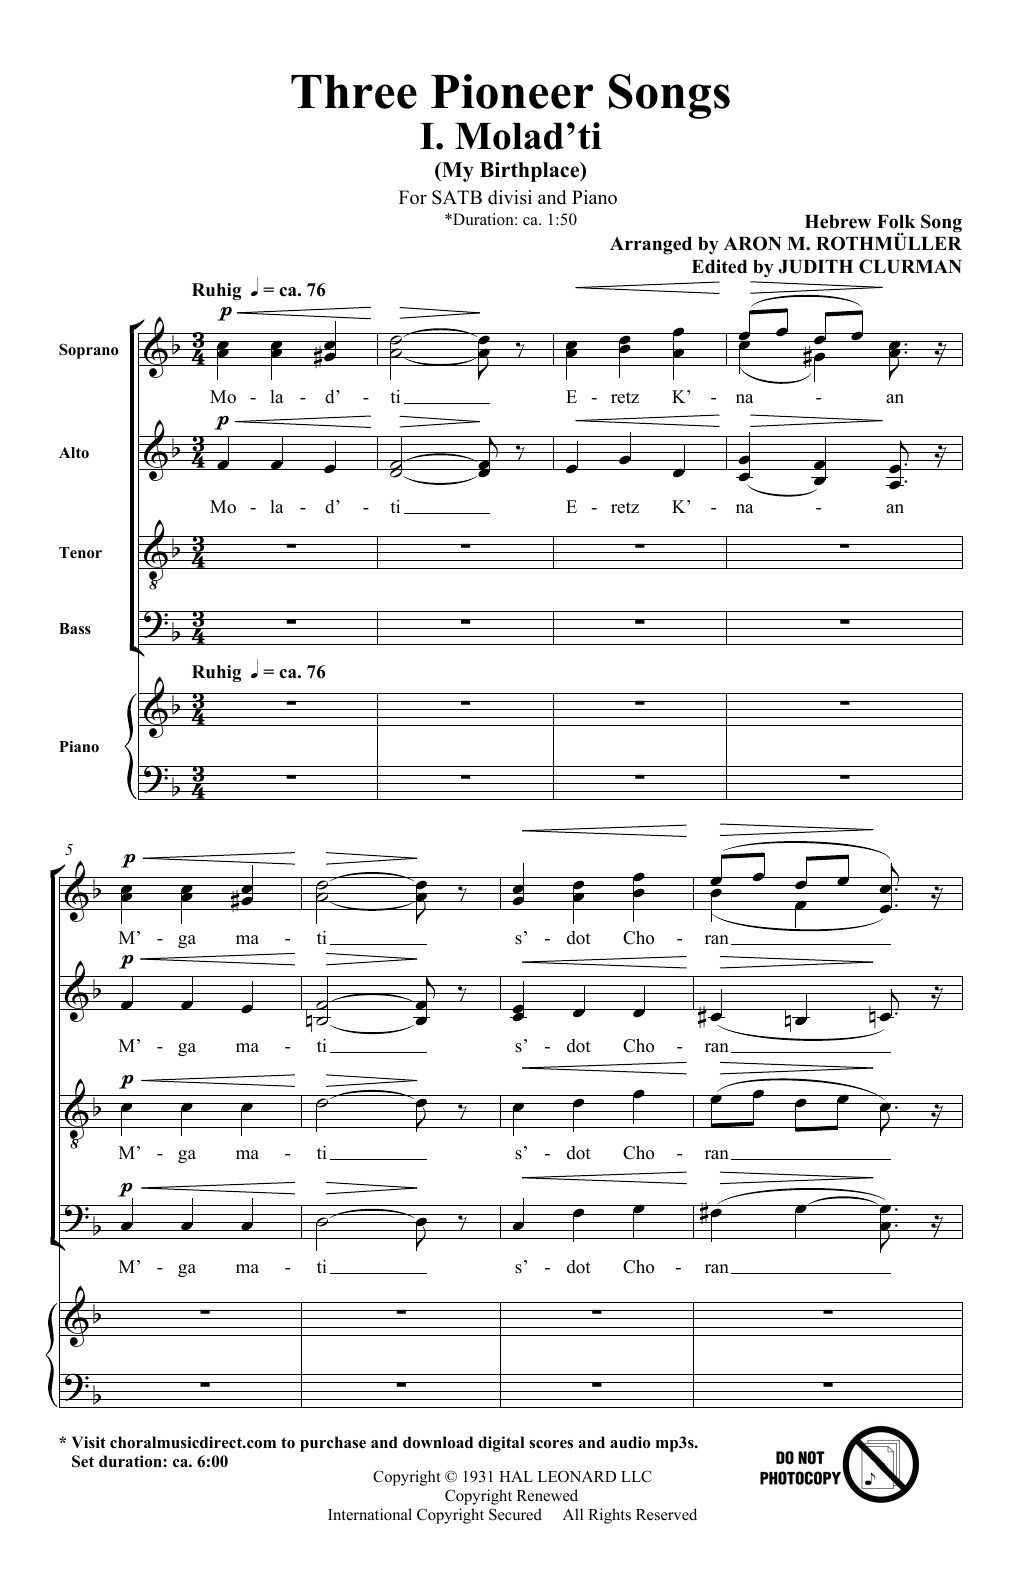 Three Pioneer Songs (SATB Choir)